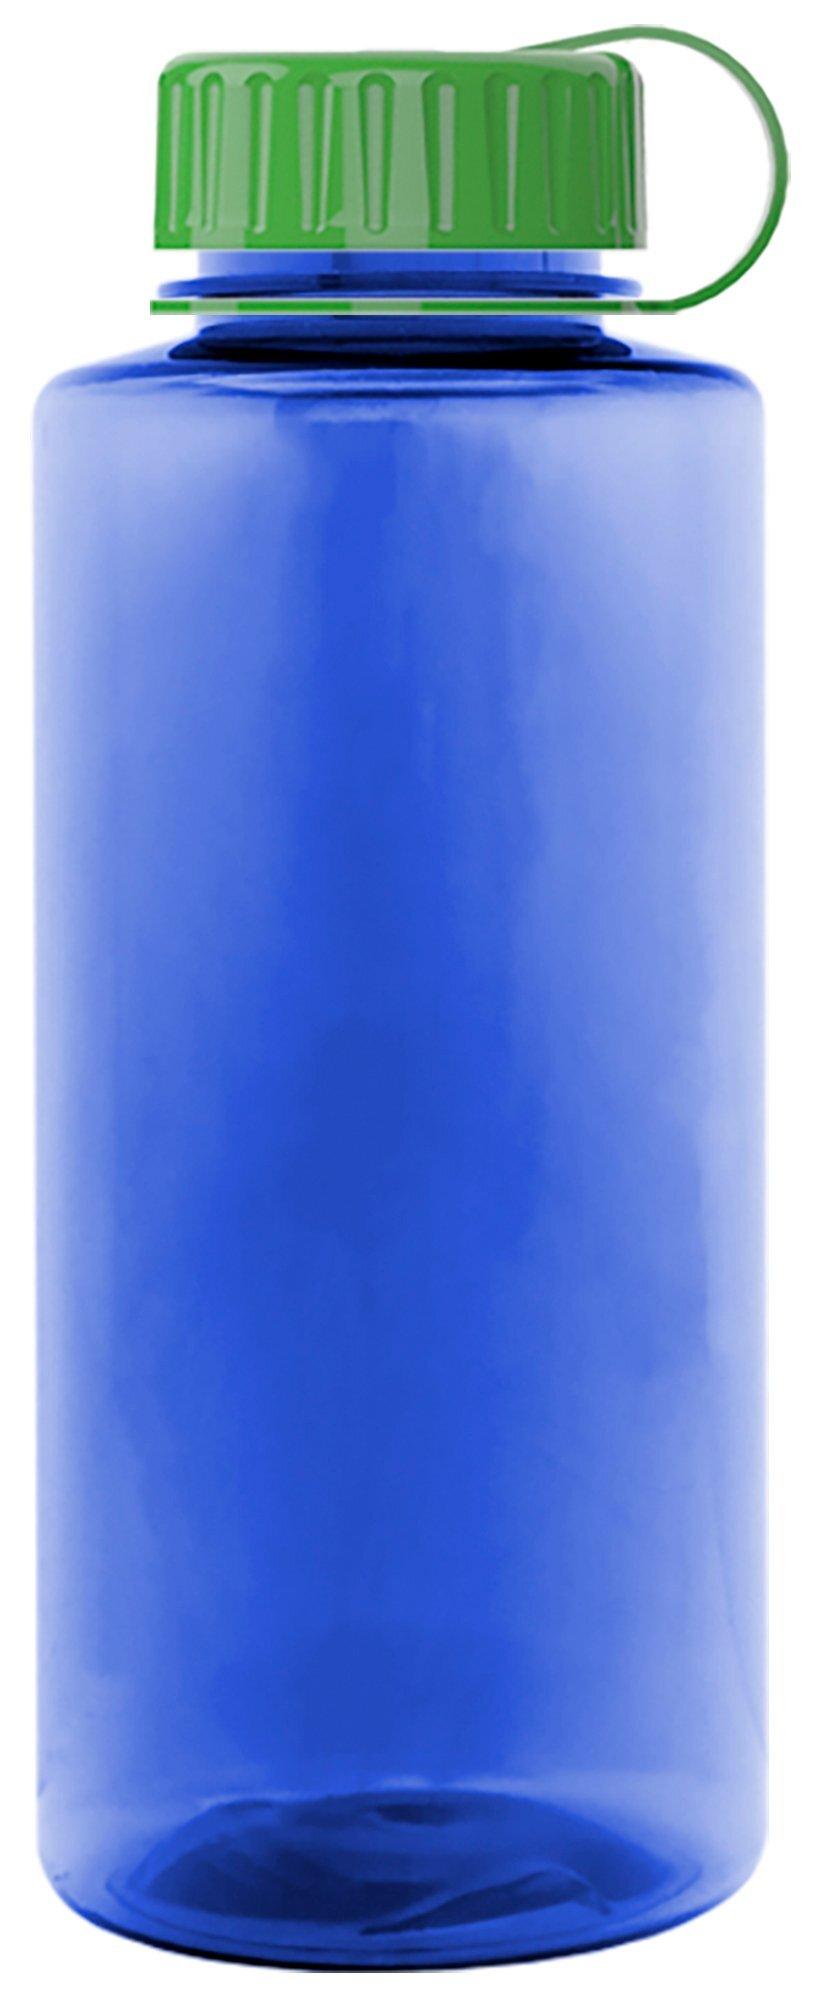 Mountain Tritan™ Sports Bottle, 36oz. - Tethered Lid